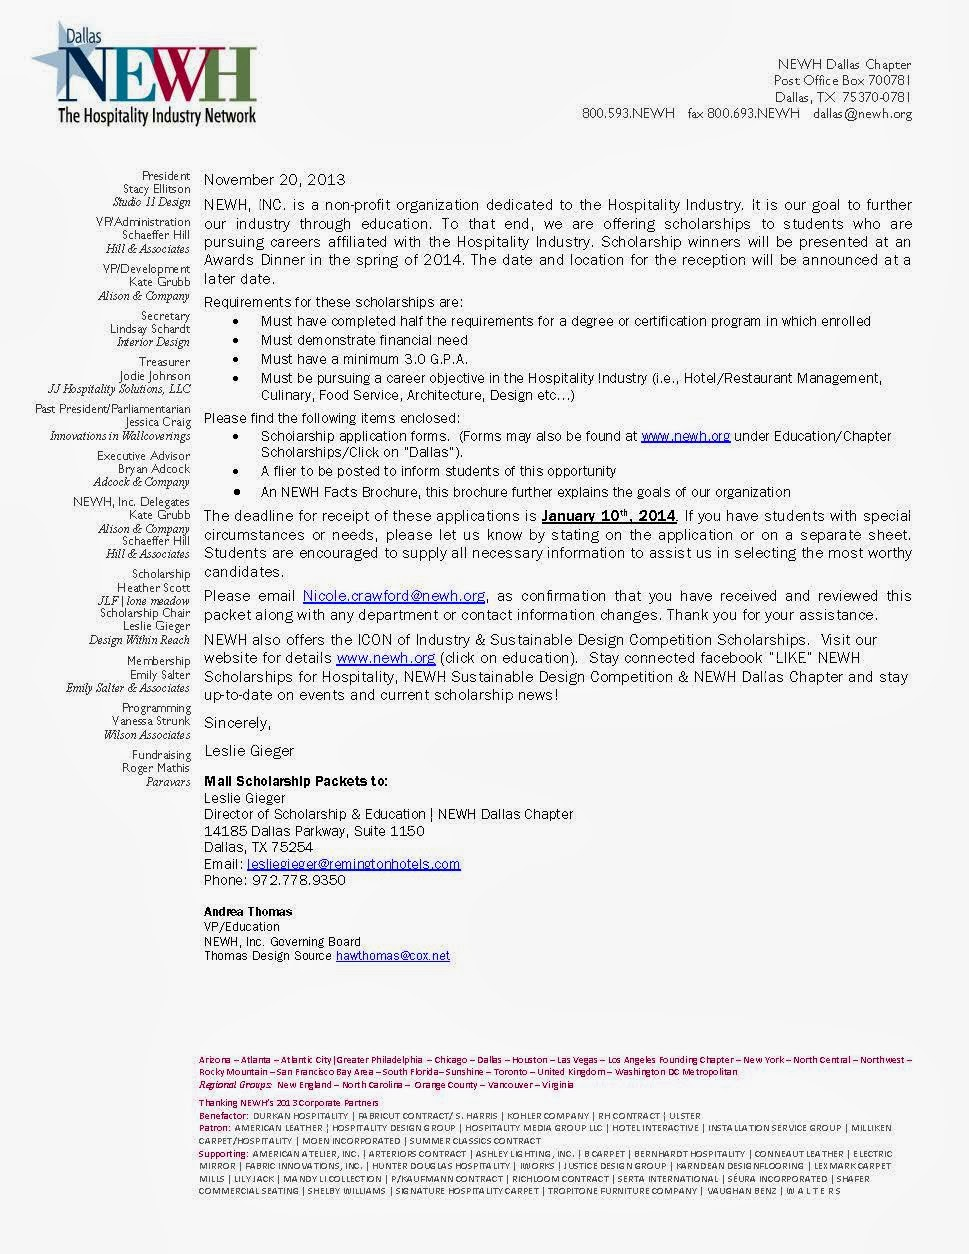 Unt Student Employment Application Form Employment